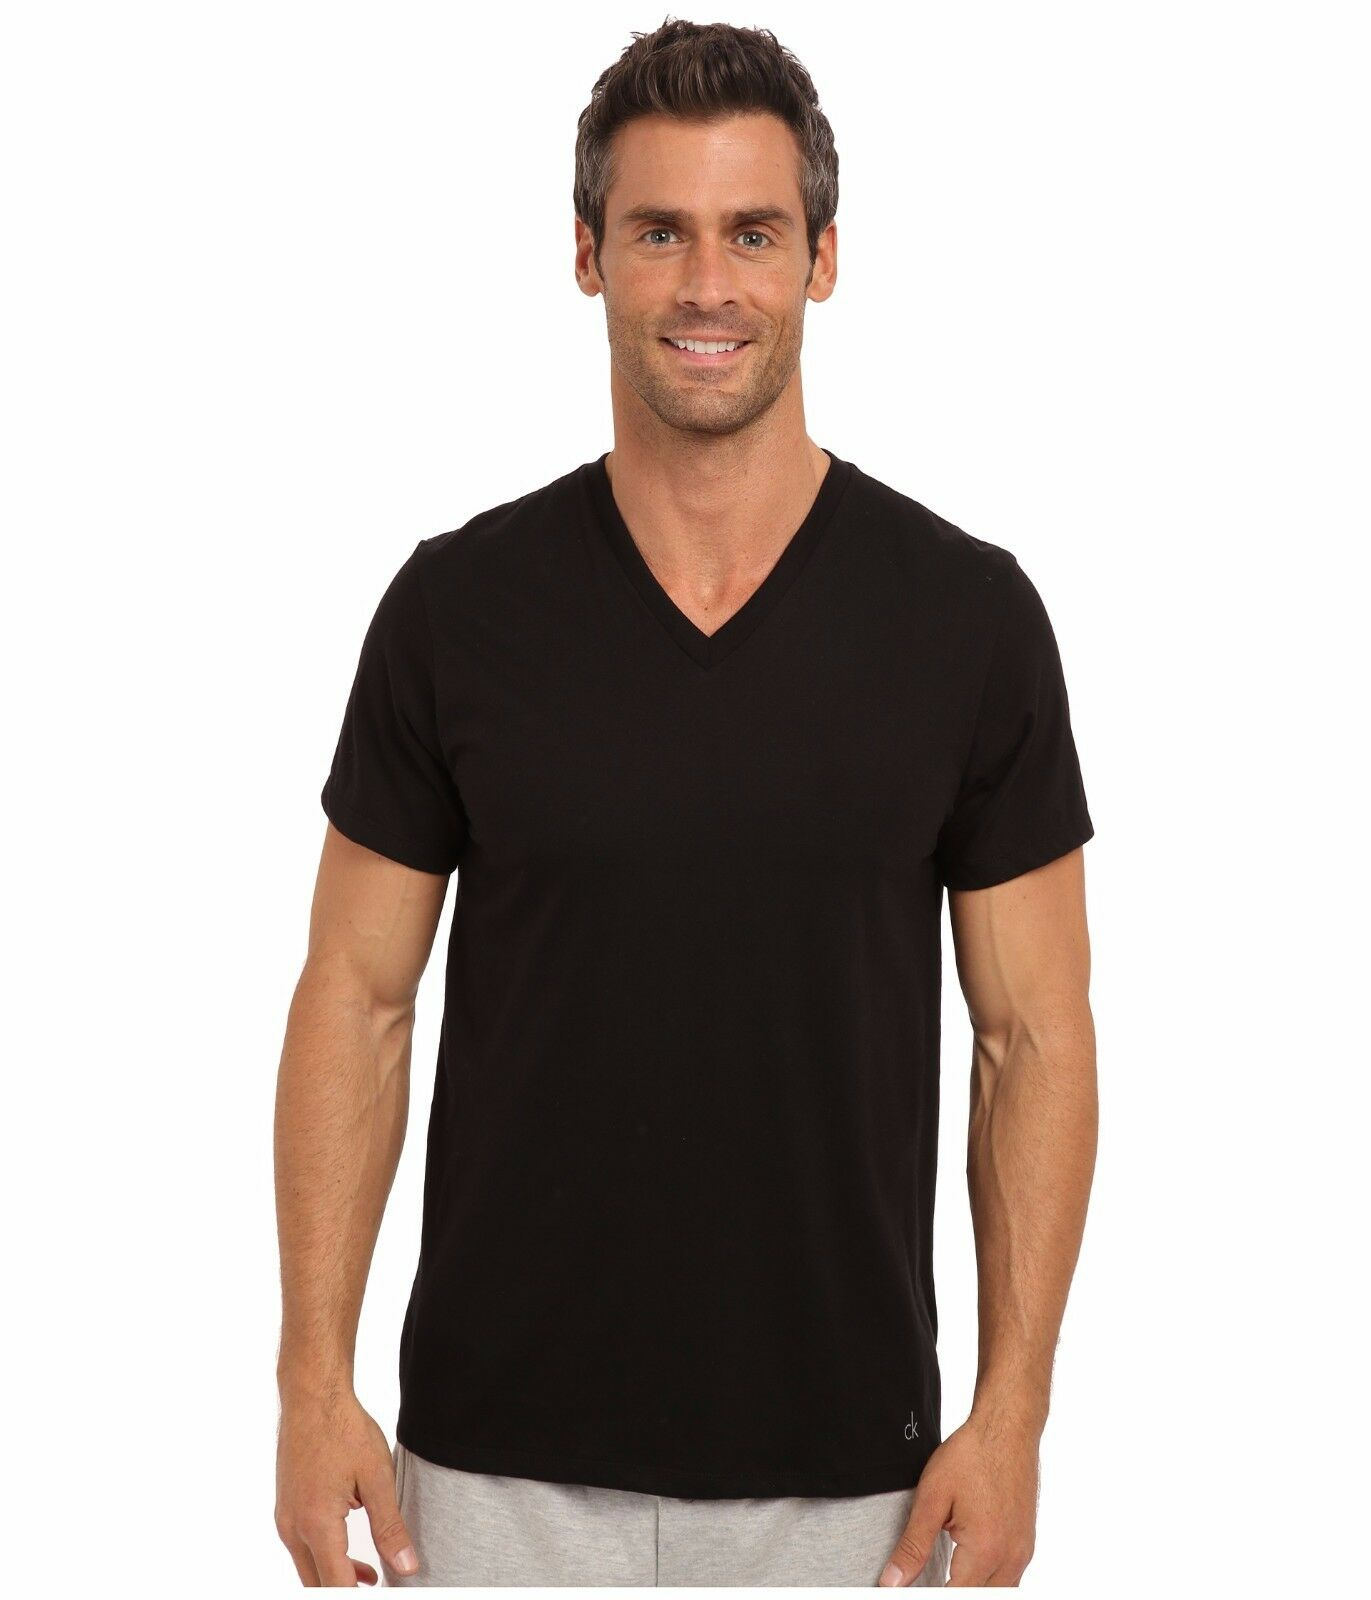 EC3052 Econscious Women/'s 100/% Cotton Short Sleeve V-Neck T-Shirt,10-Pack